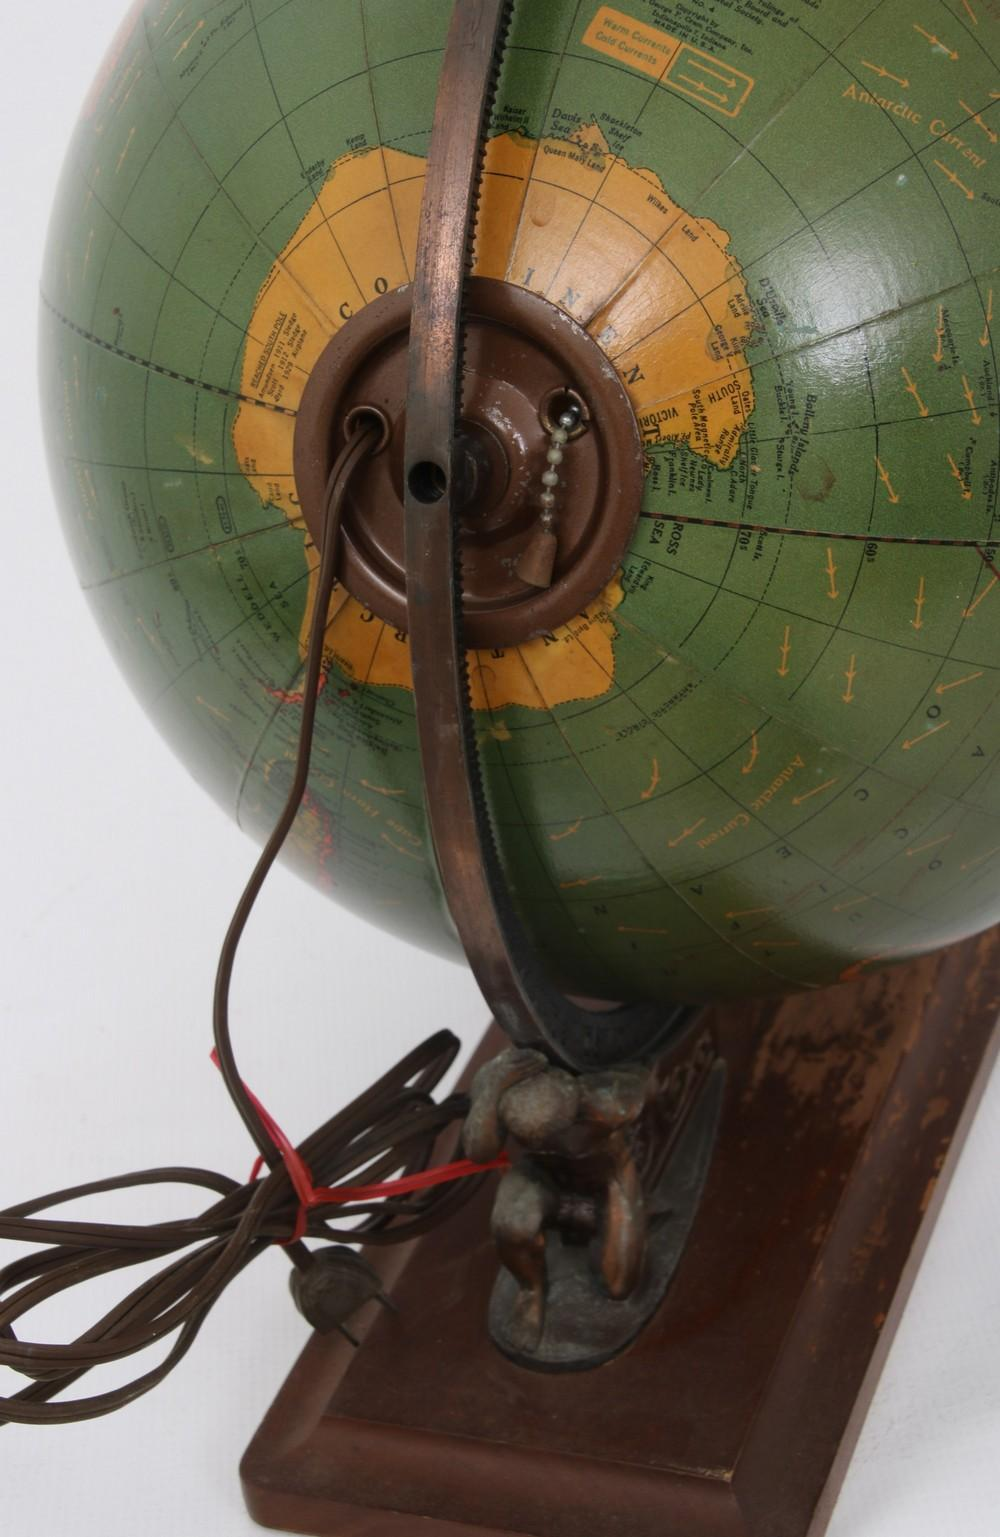 Cram's Unrivaled Terrestrial Light Up Globe